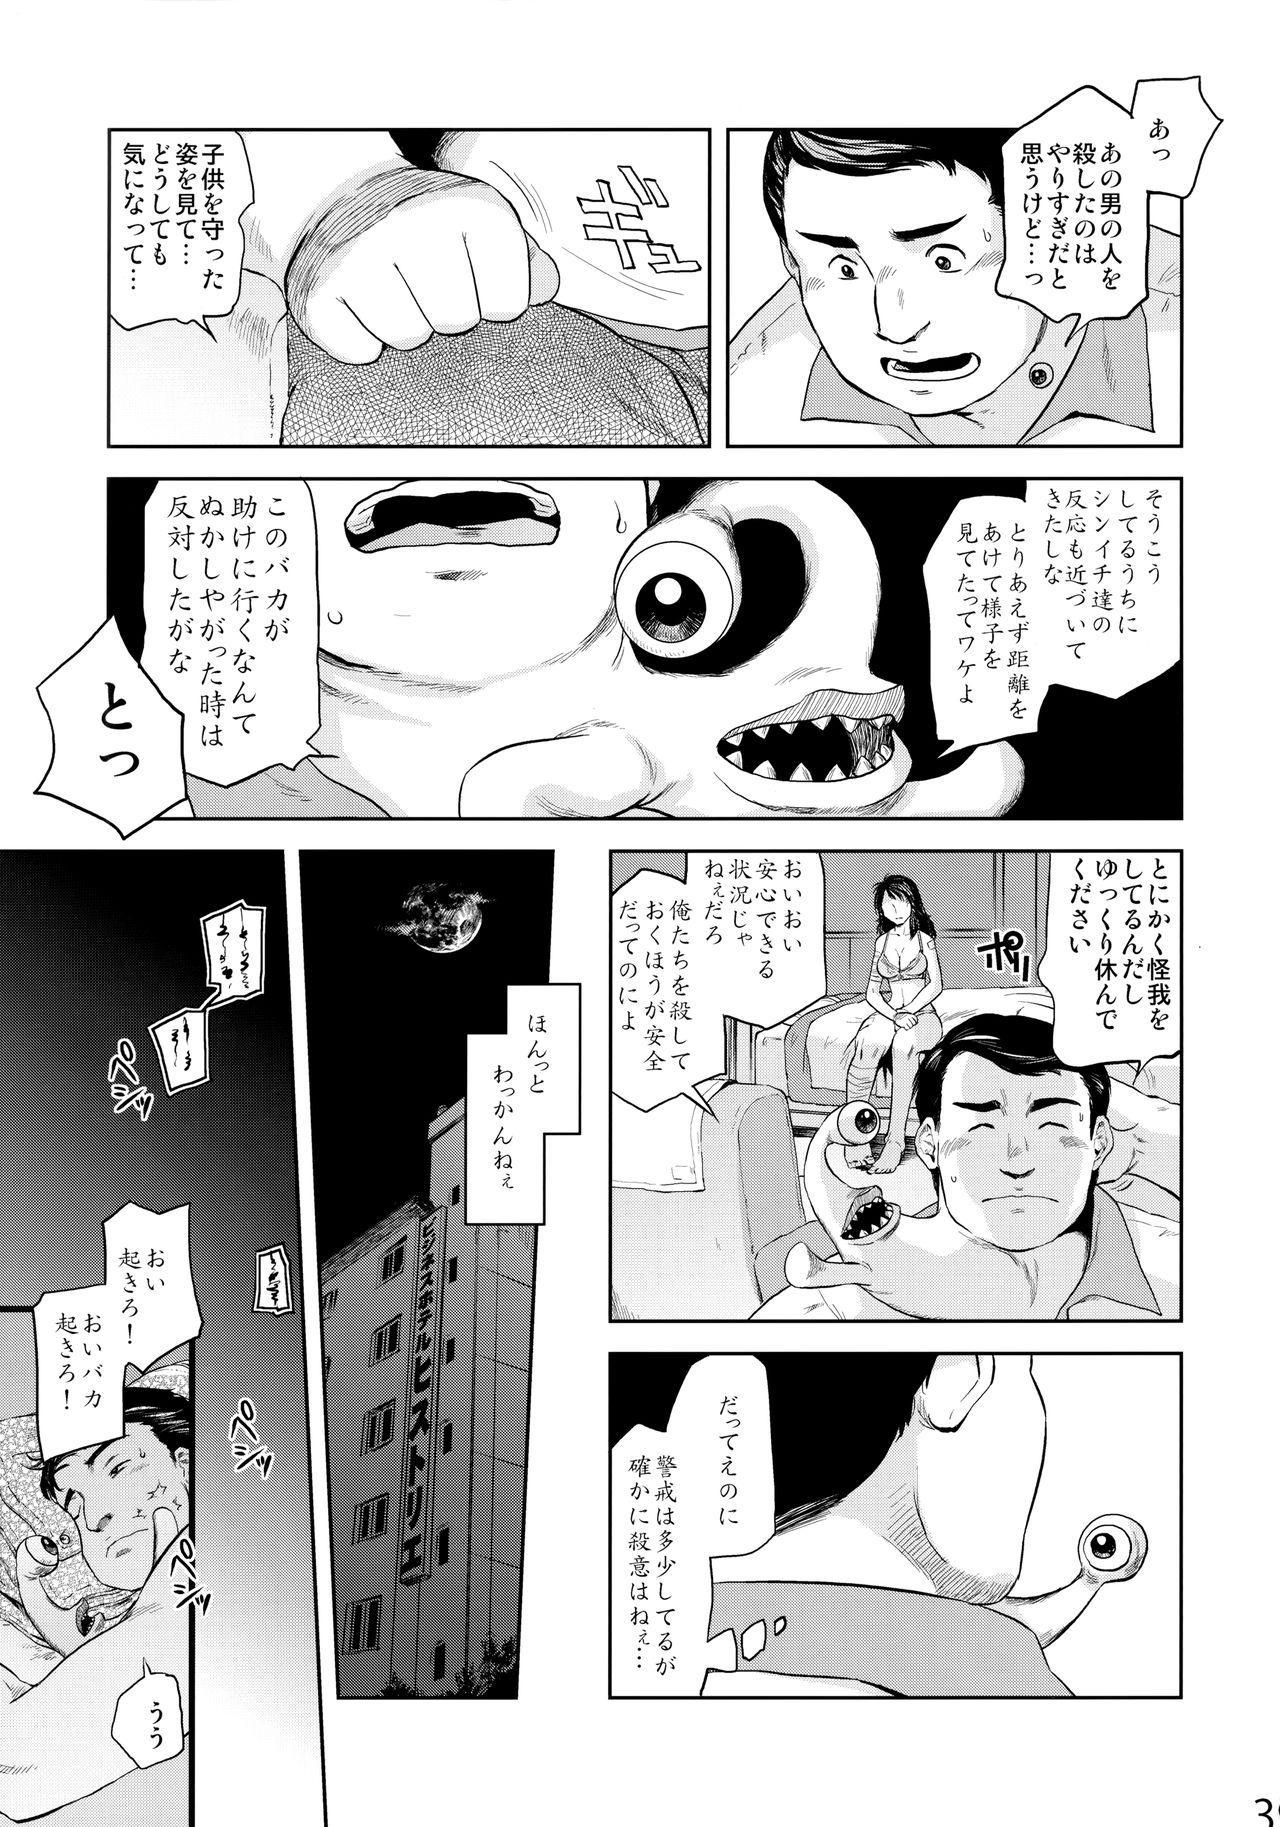 Yomeiri 37